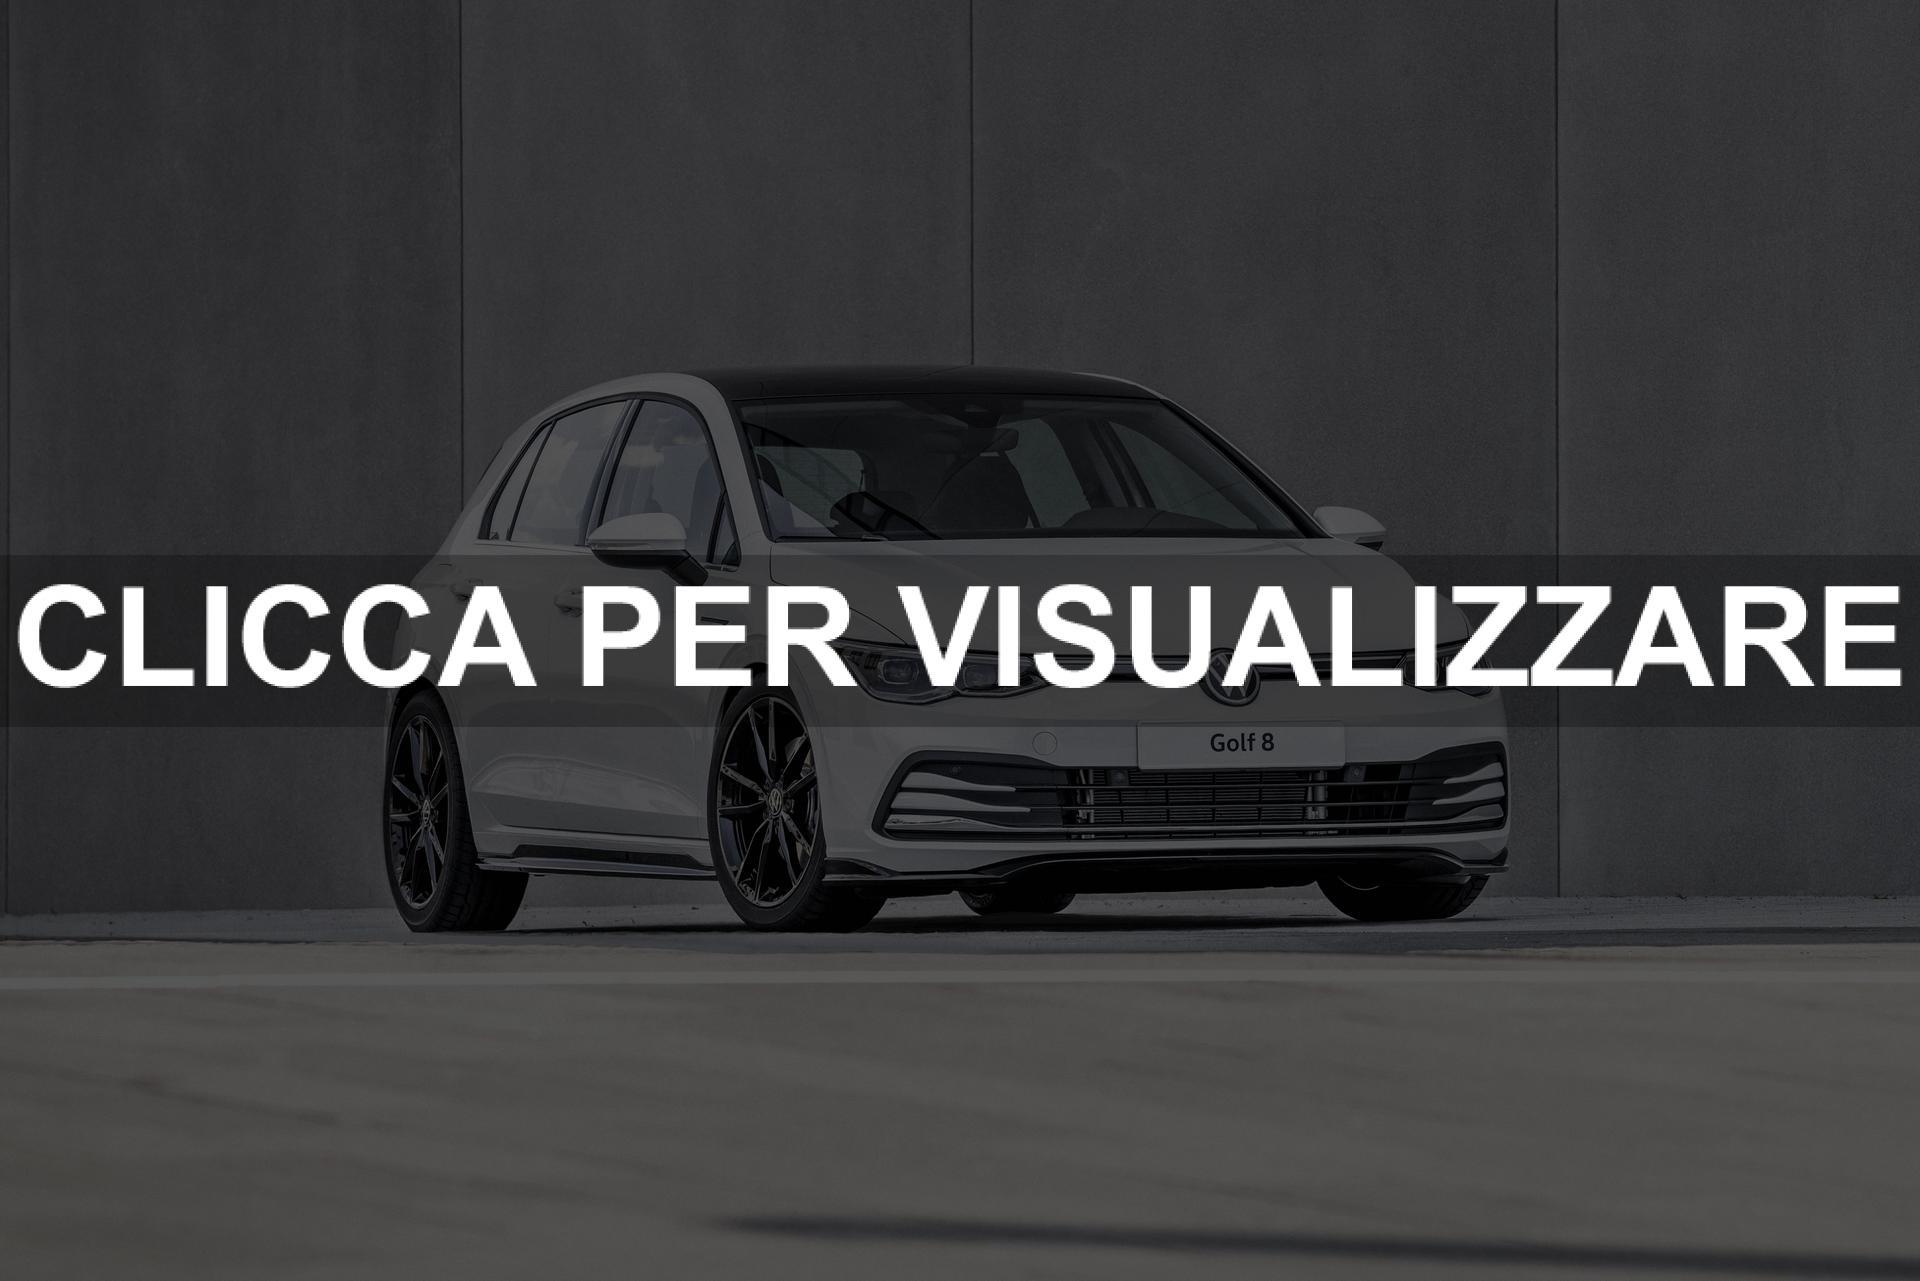 Nuova Volkswagen Golf 8 tuning 2020